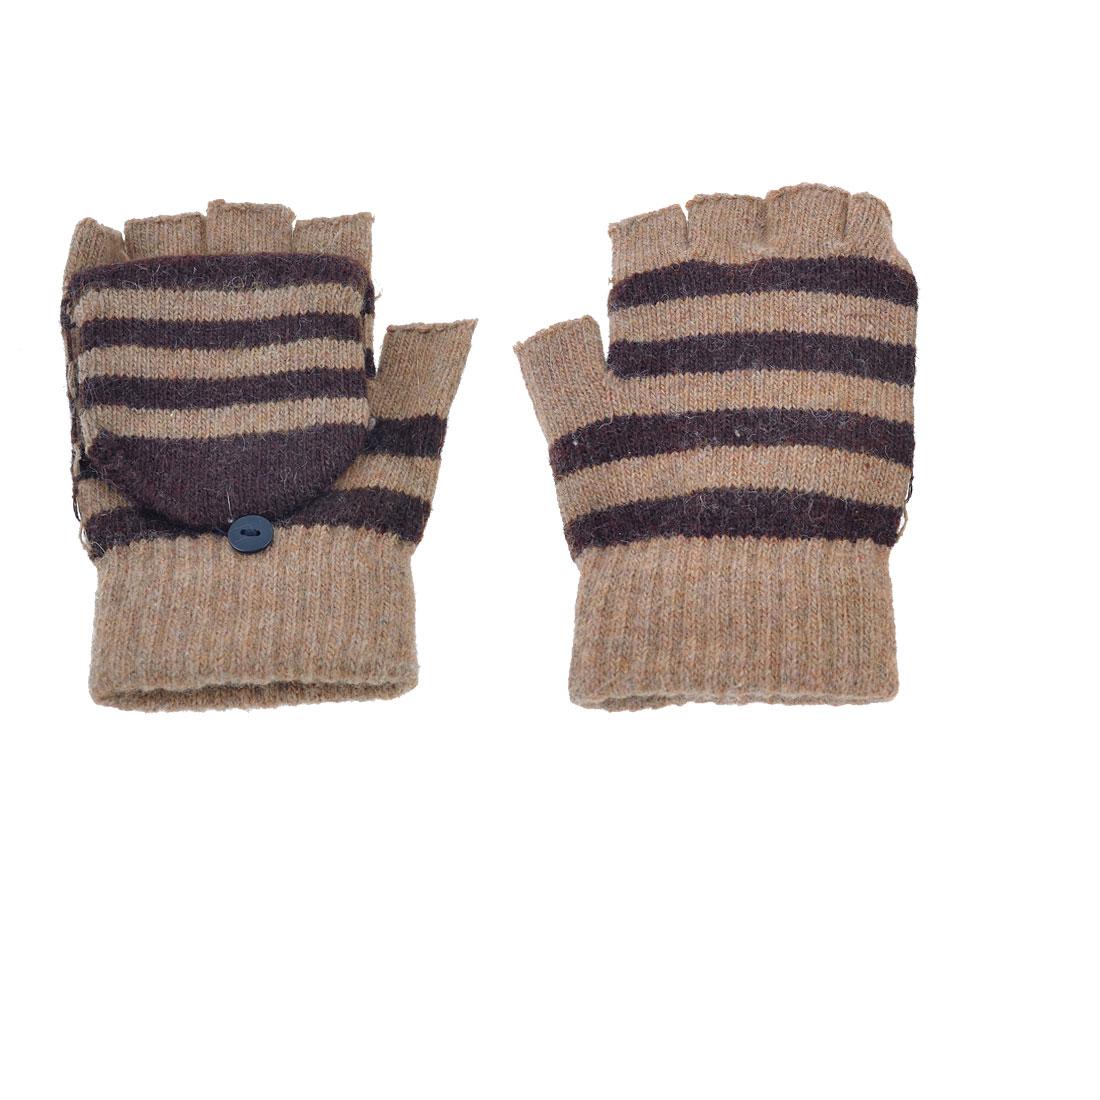 Stripe Ribbed Knitted Acrylic Flap Cover Fingerless Gloves Pair Khaki for Unisex